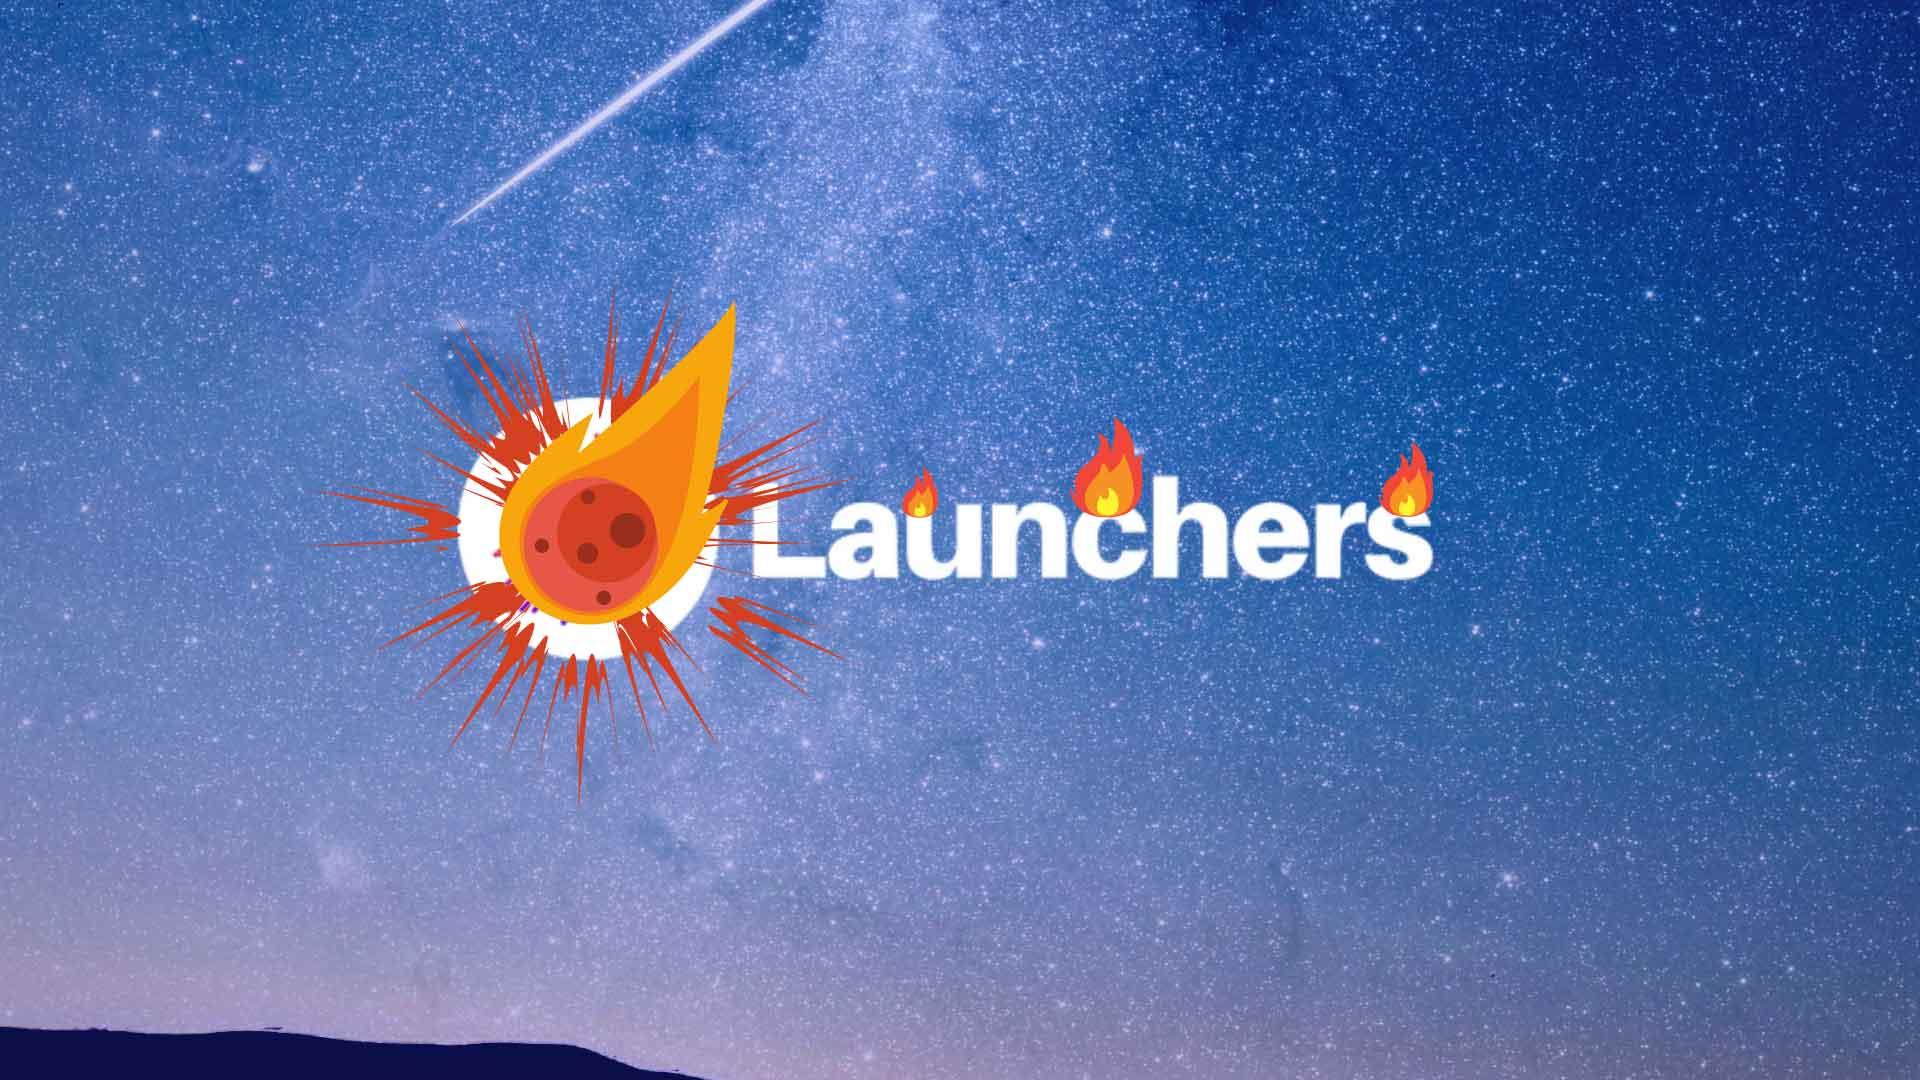 launchers canceled